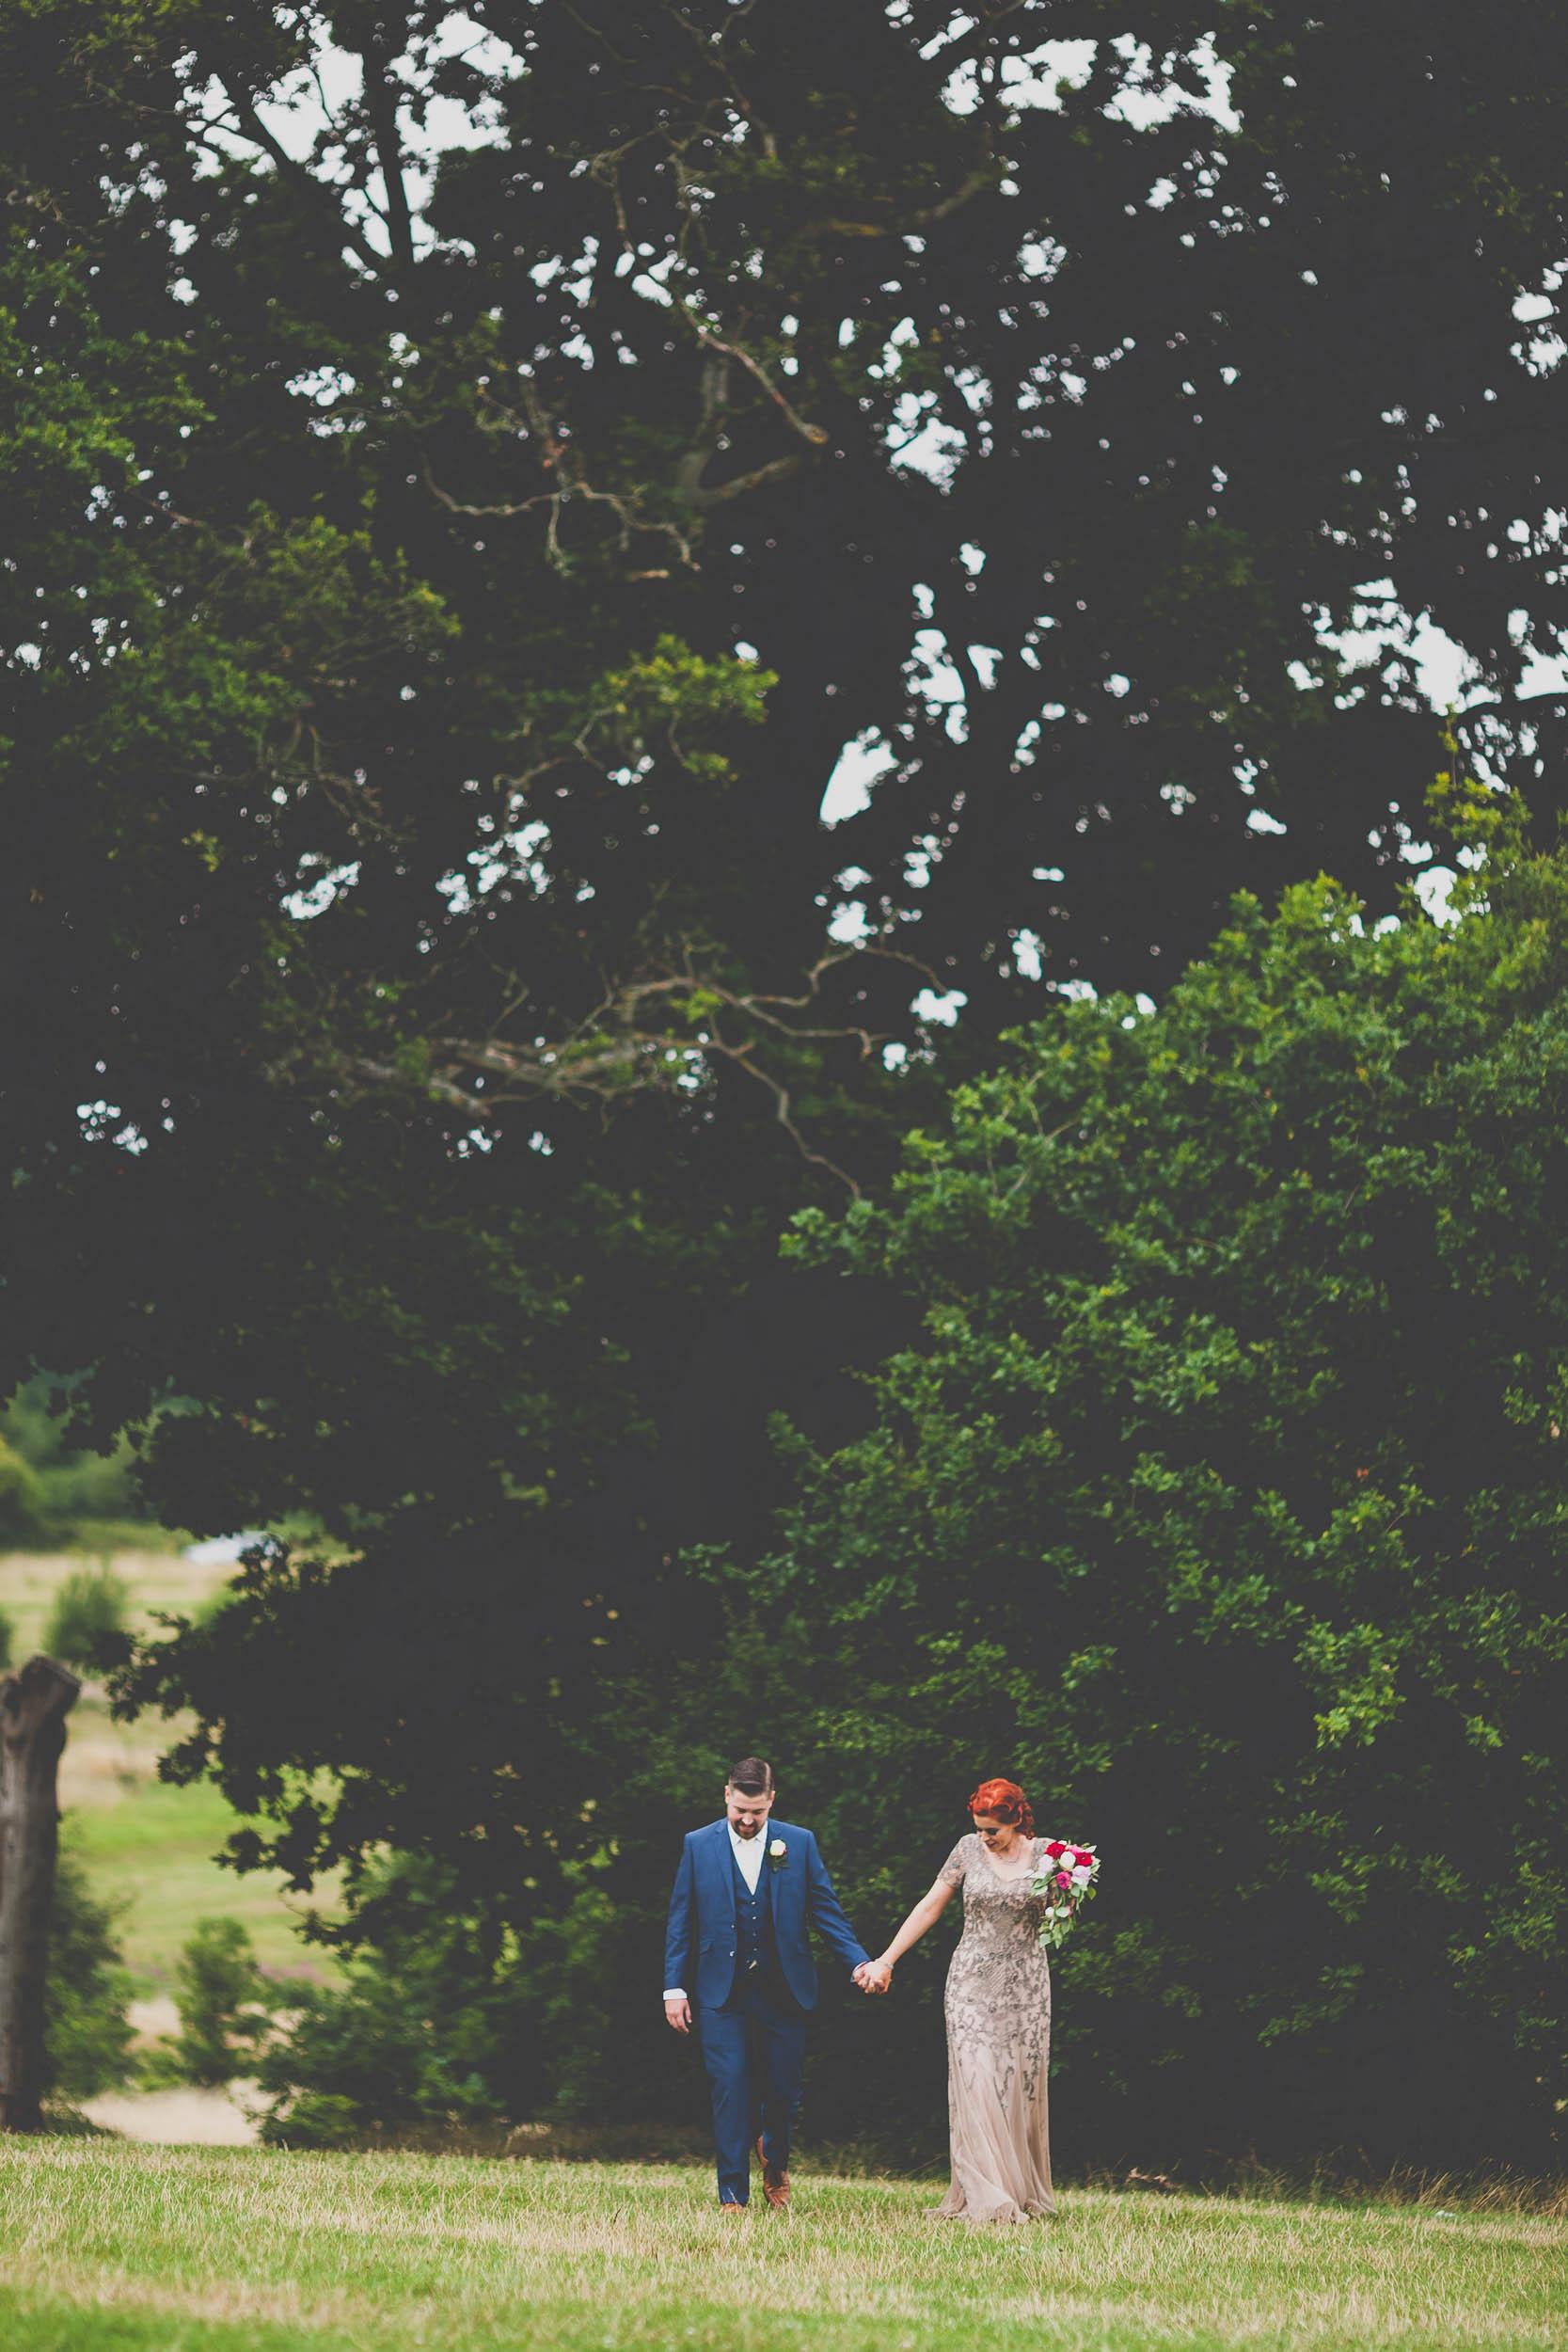 queen-elizabeths-hunting-lodge-epping-forest-wedding194.jpg